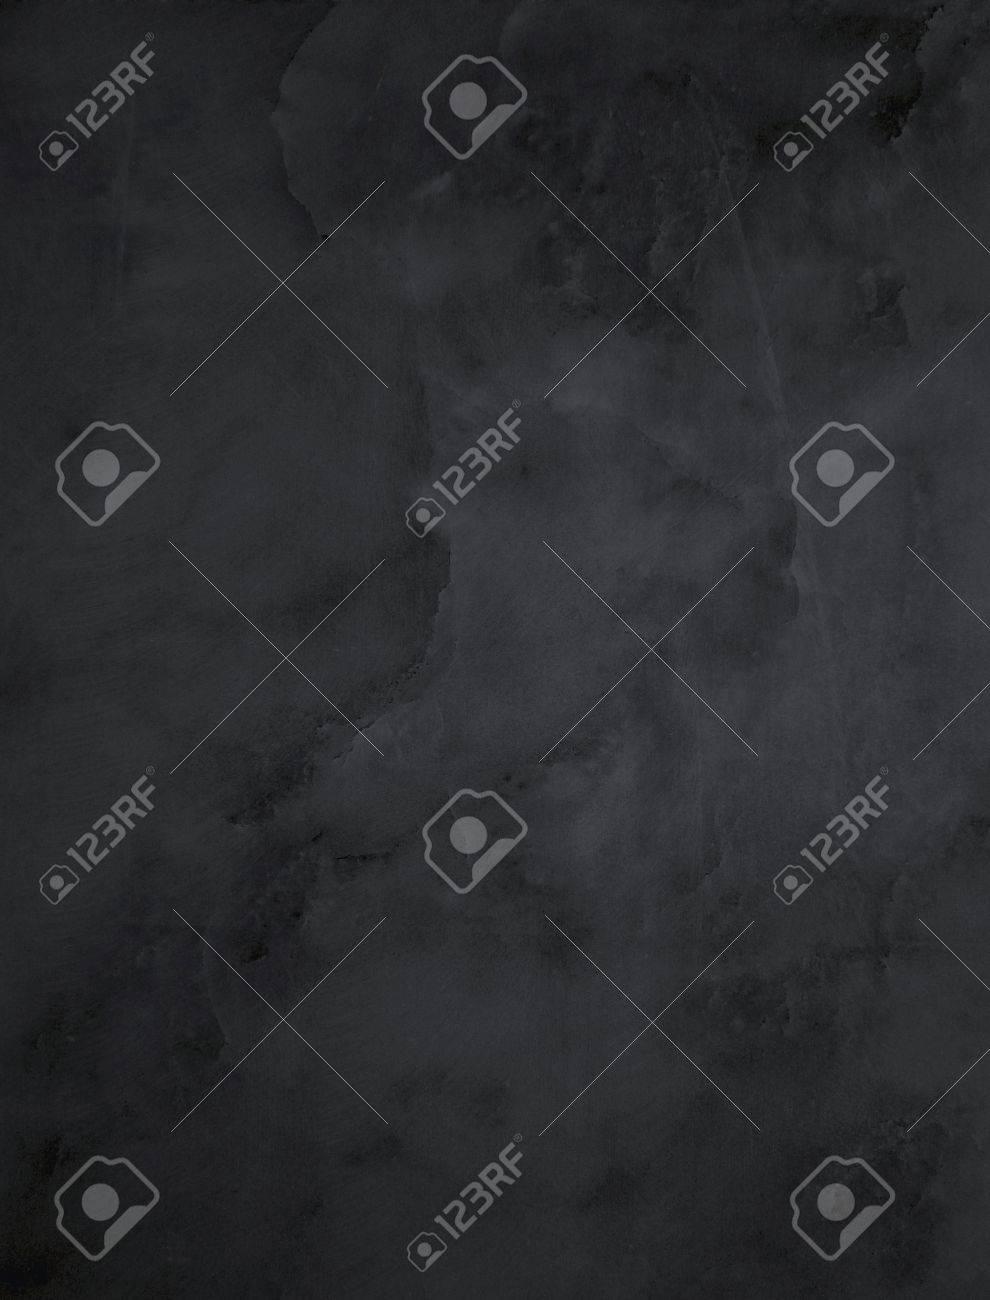 free high resolution chalkboard background